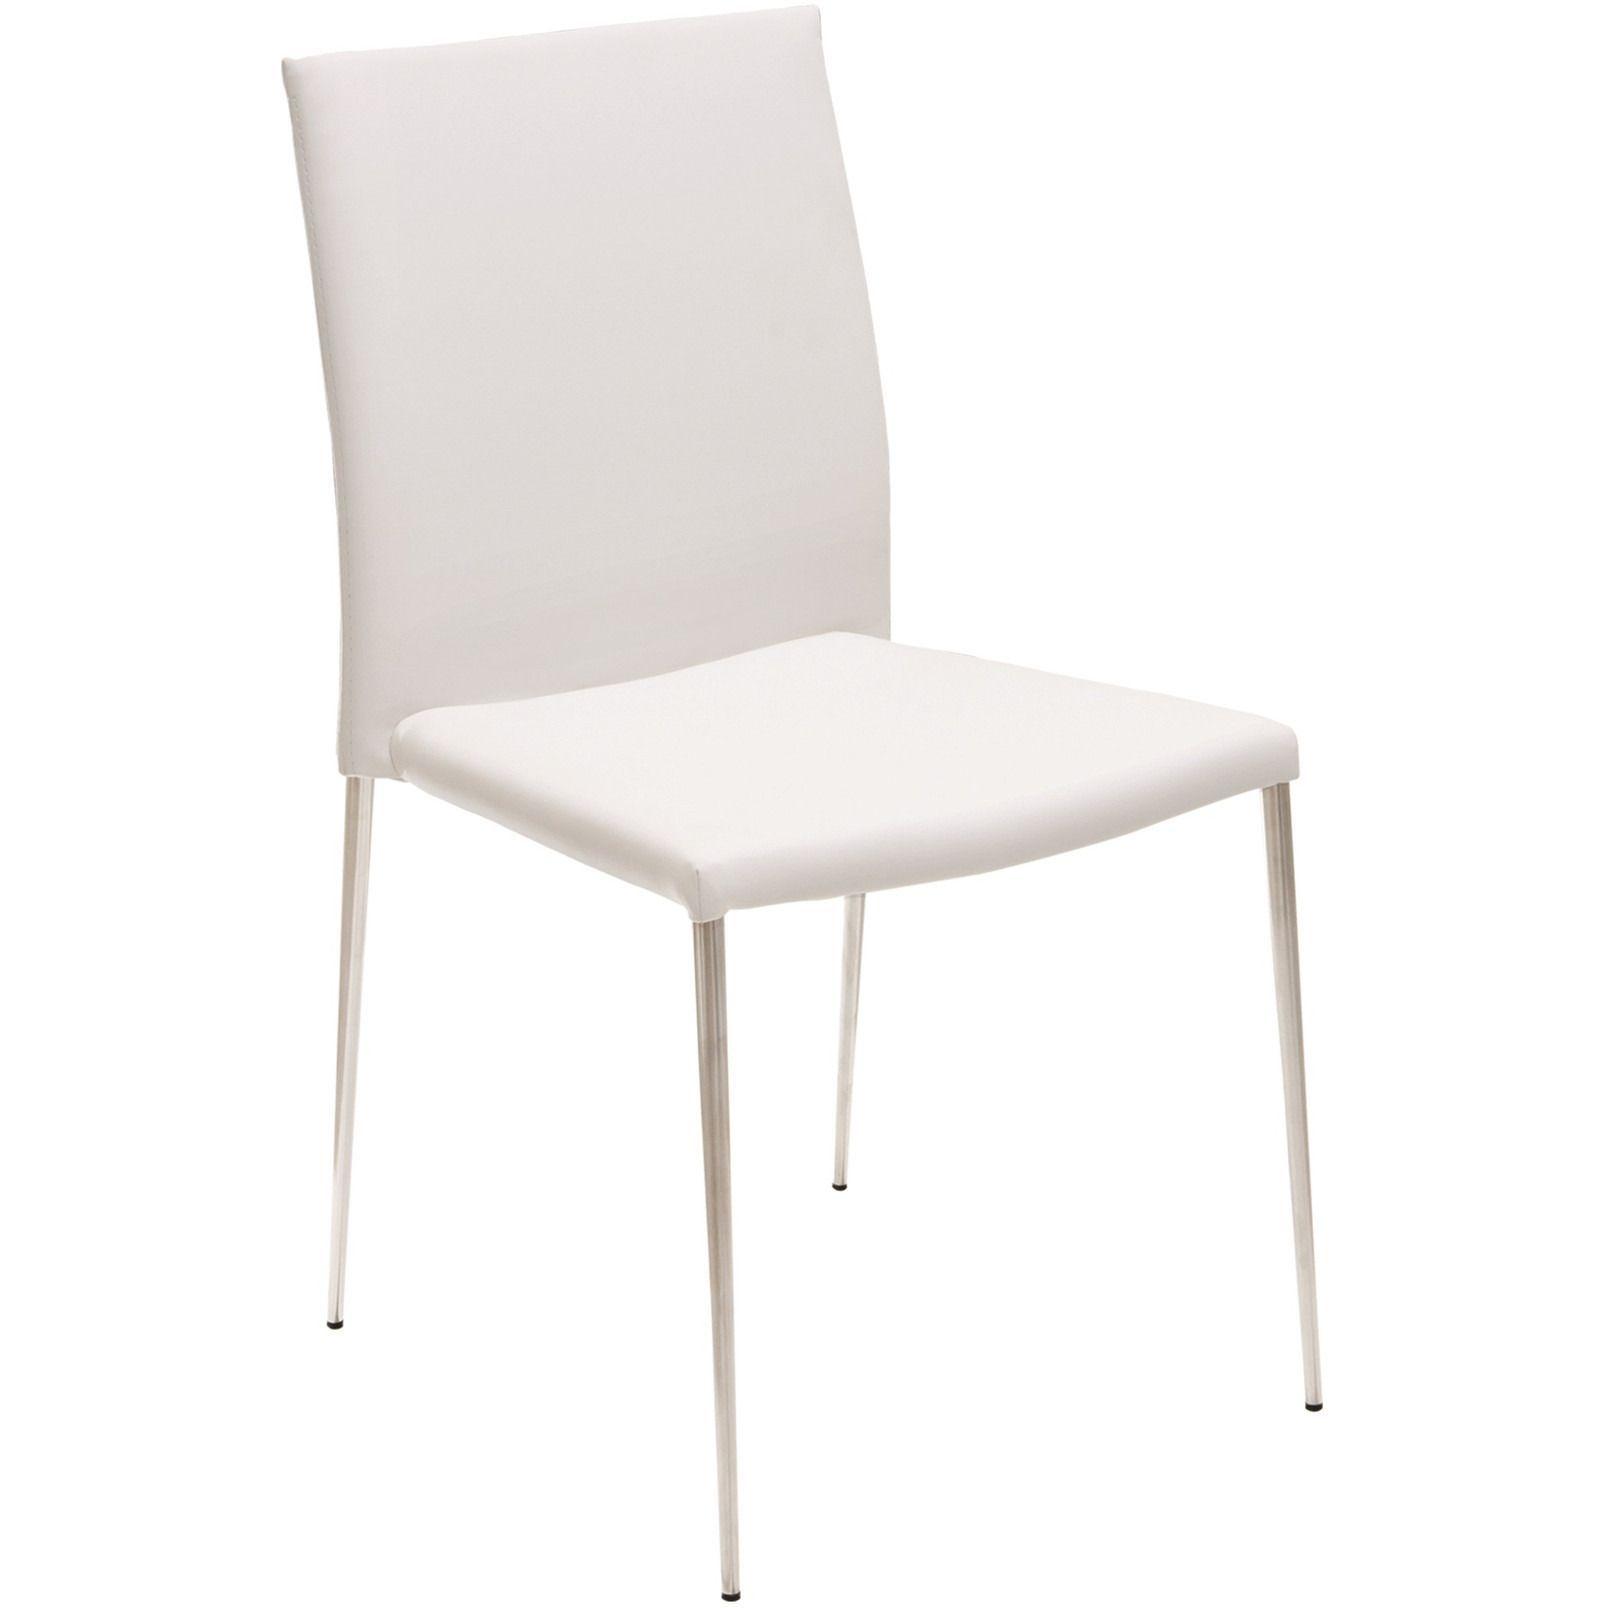 Casabianca Aldo Leather TC-181-G Dining Chair